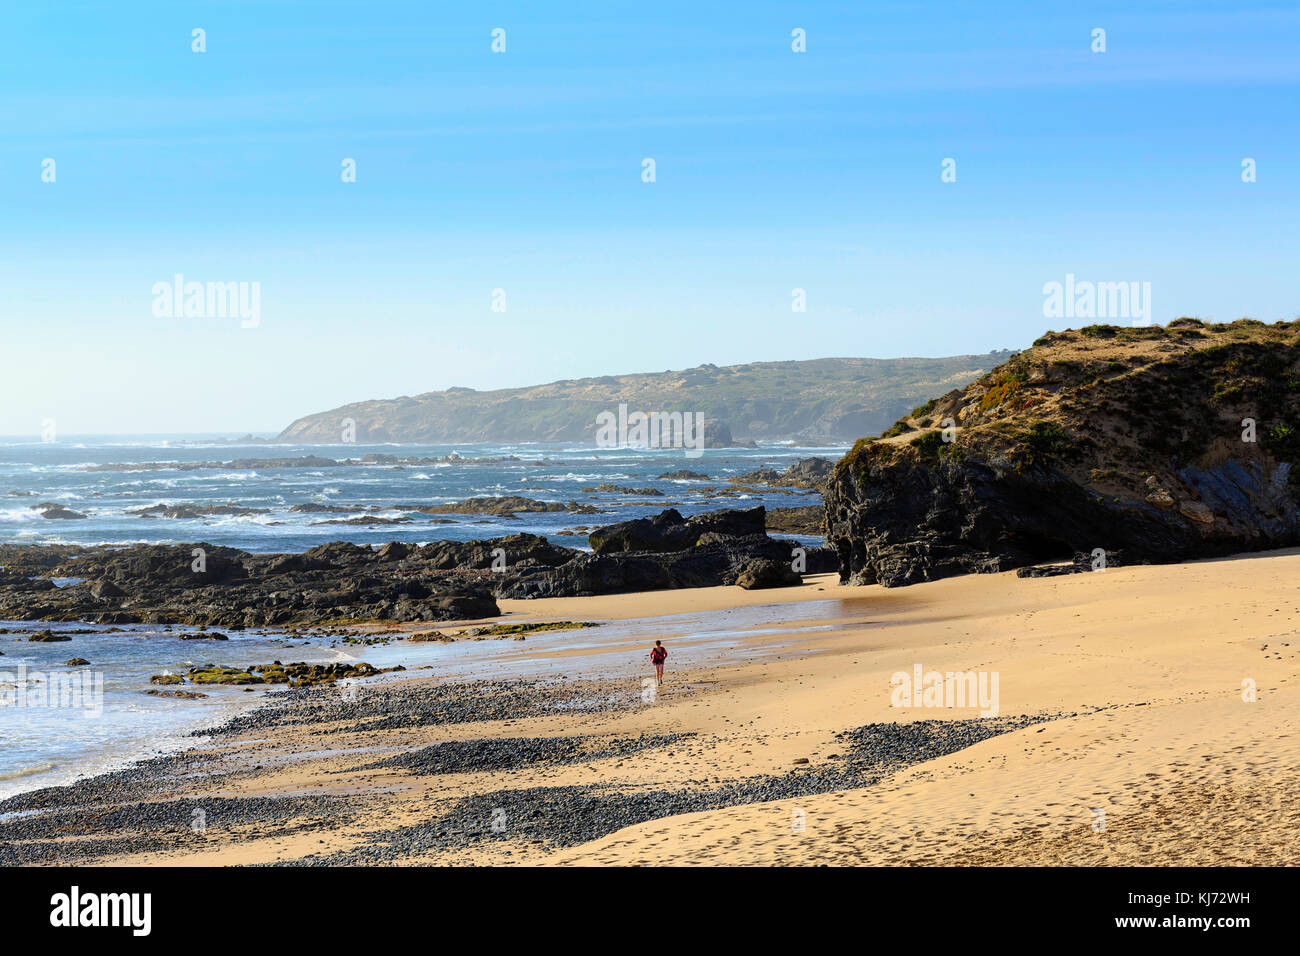 A beautiful deserted beach in the Portuguese Alentejo - Stock Image